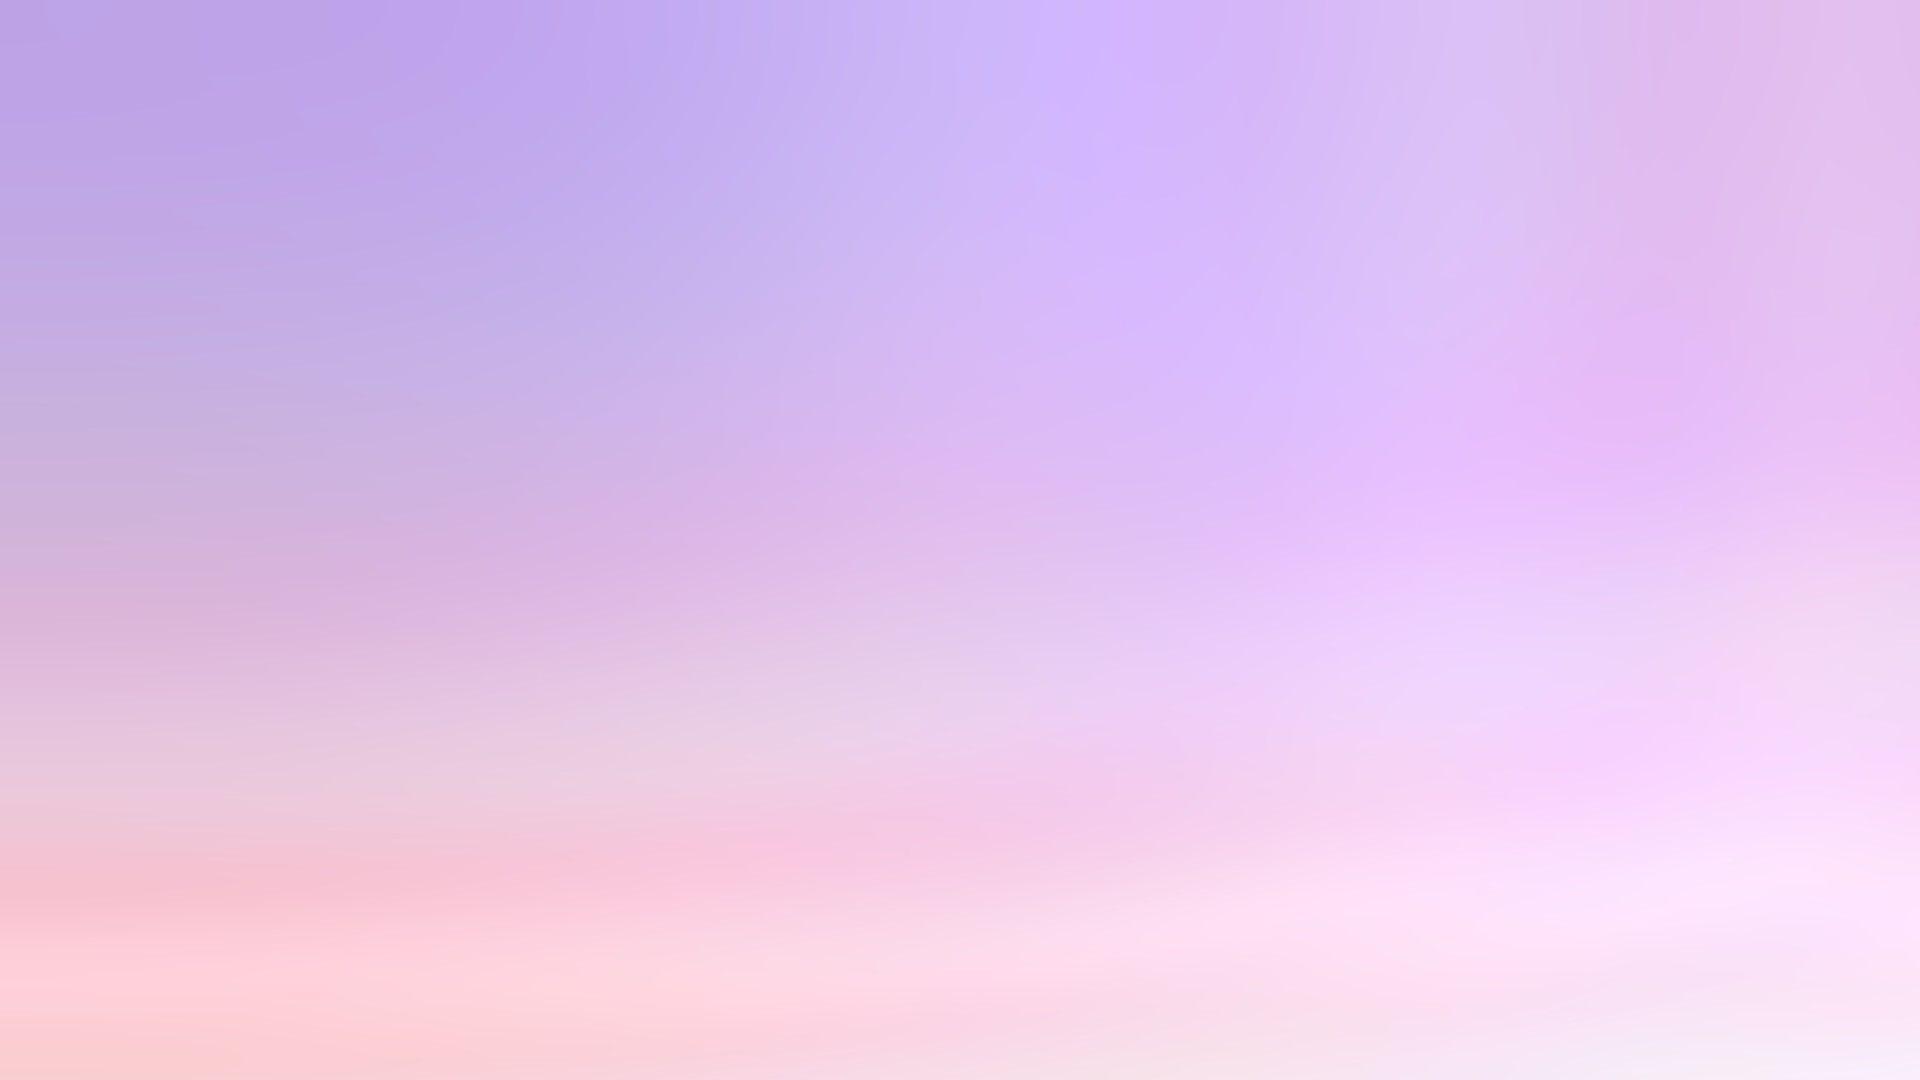 Light Purple Backgrounds